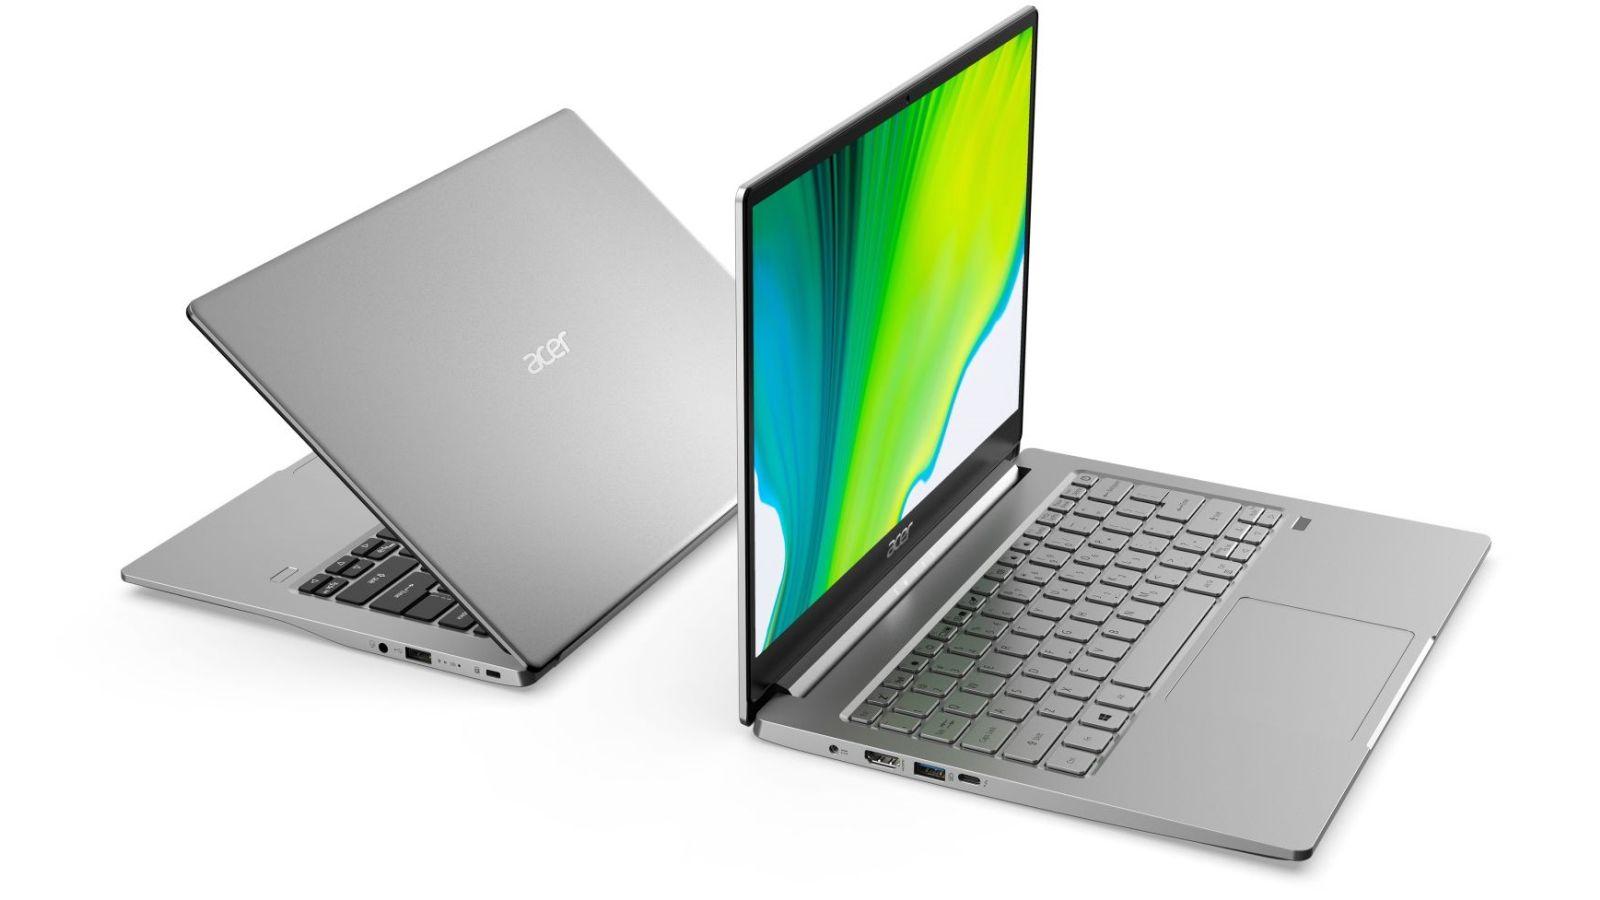 Acer Swift 3, CES 2020